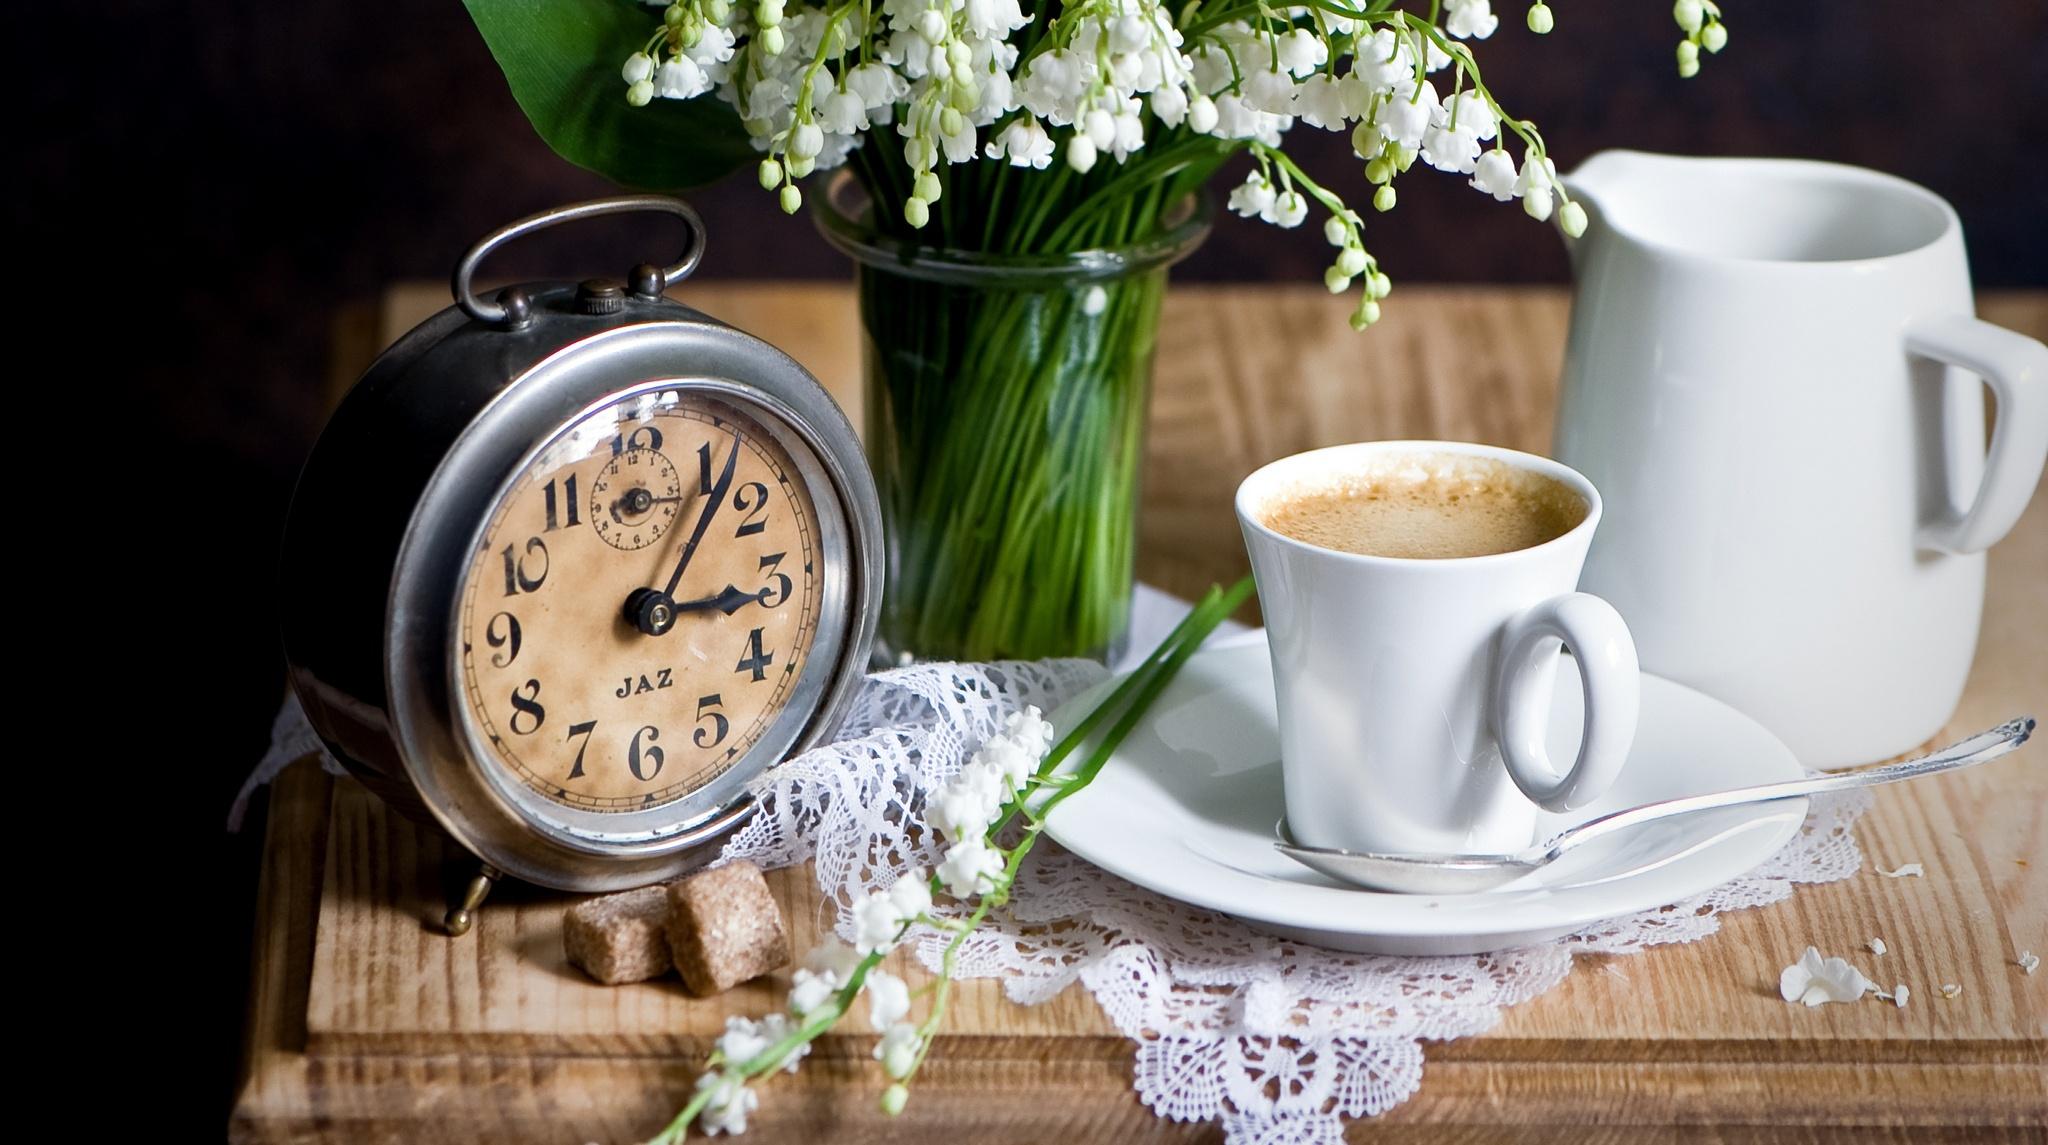 Картинка кофе и весна